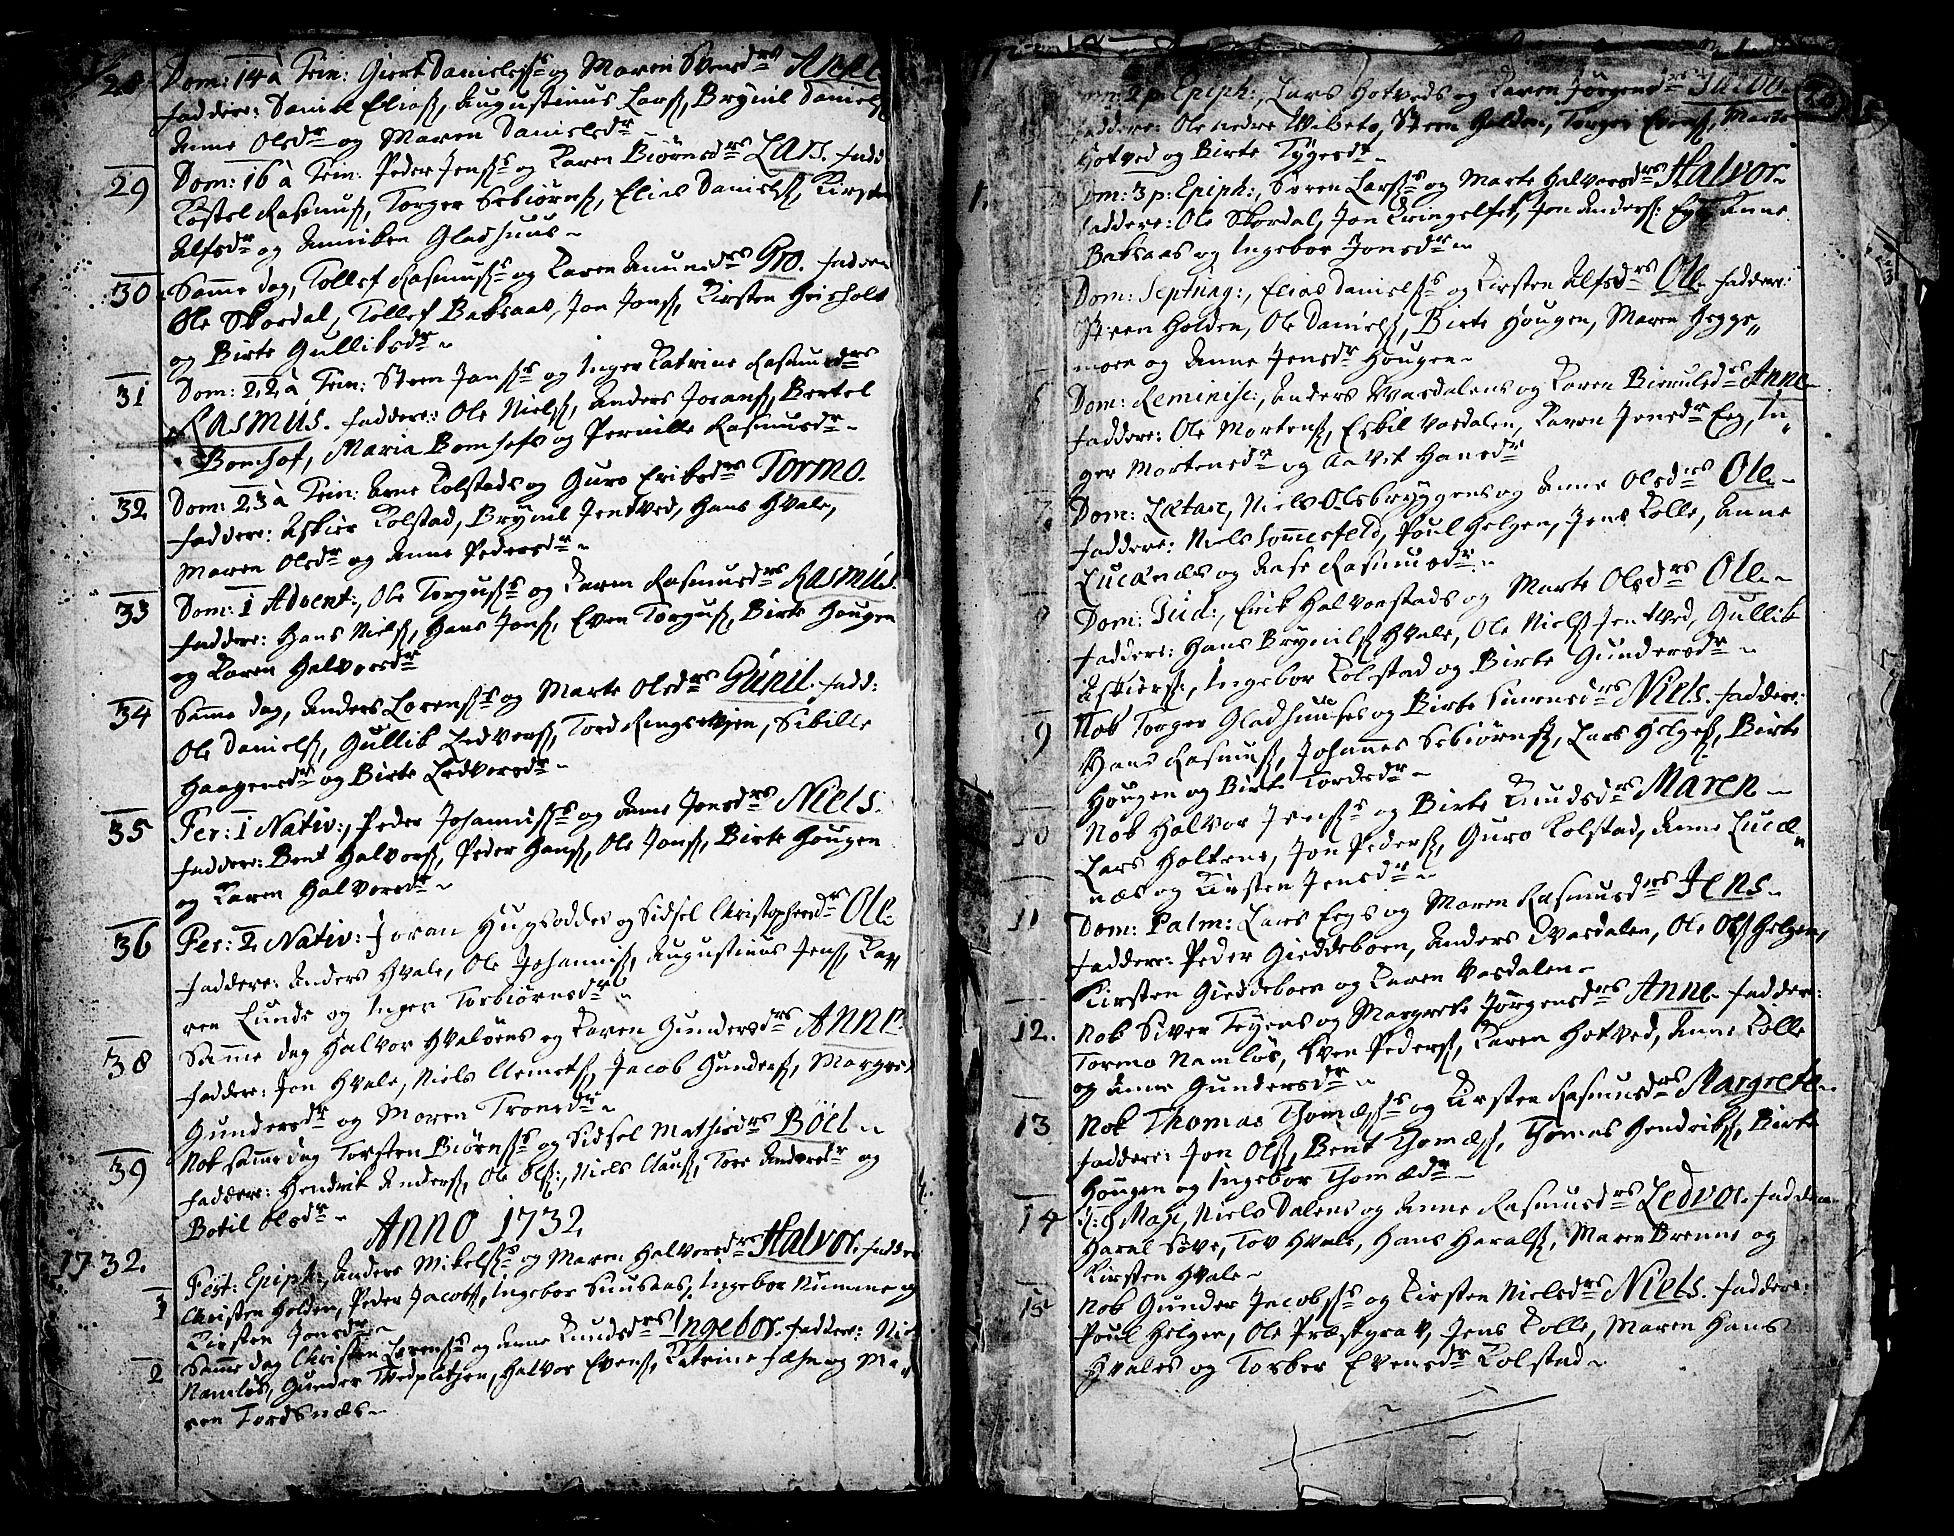 SAKO, Holla kirkebøker, F/Fa/L0001: Ministerialbok nr. 1, 1717-1779, s. 20